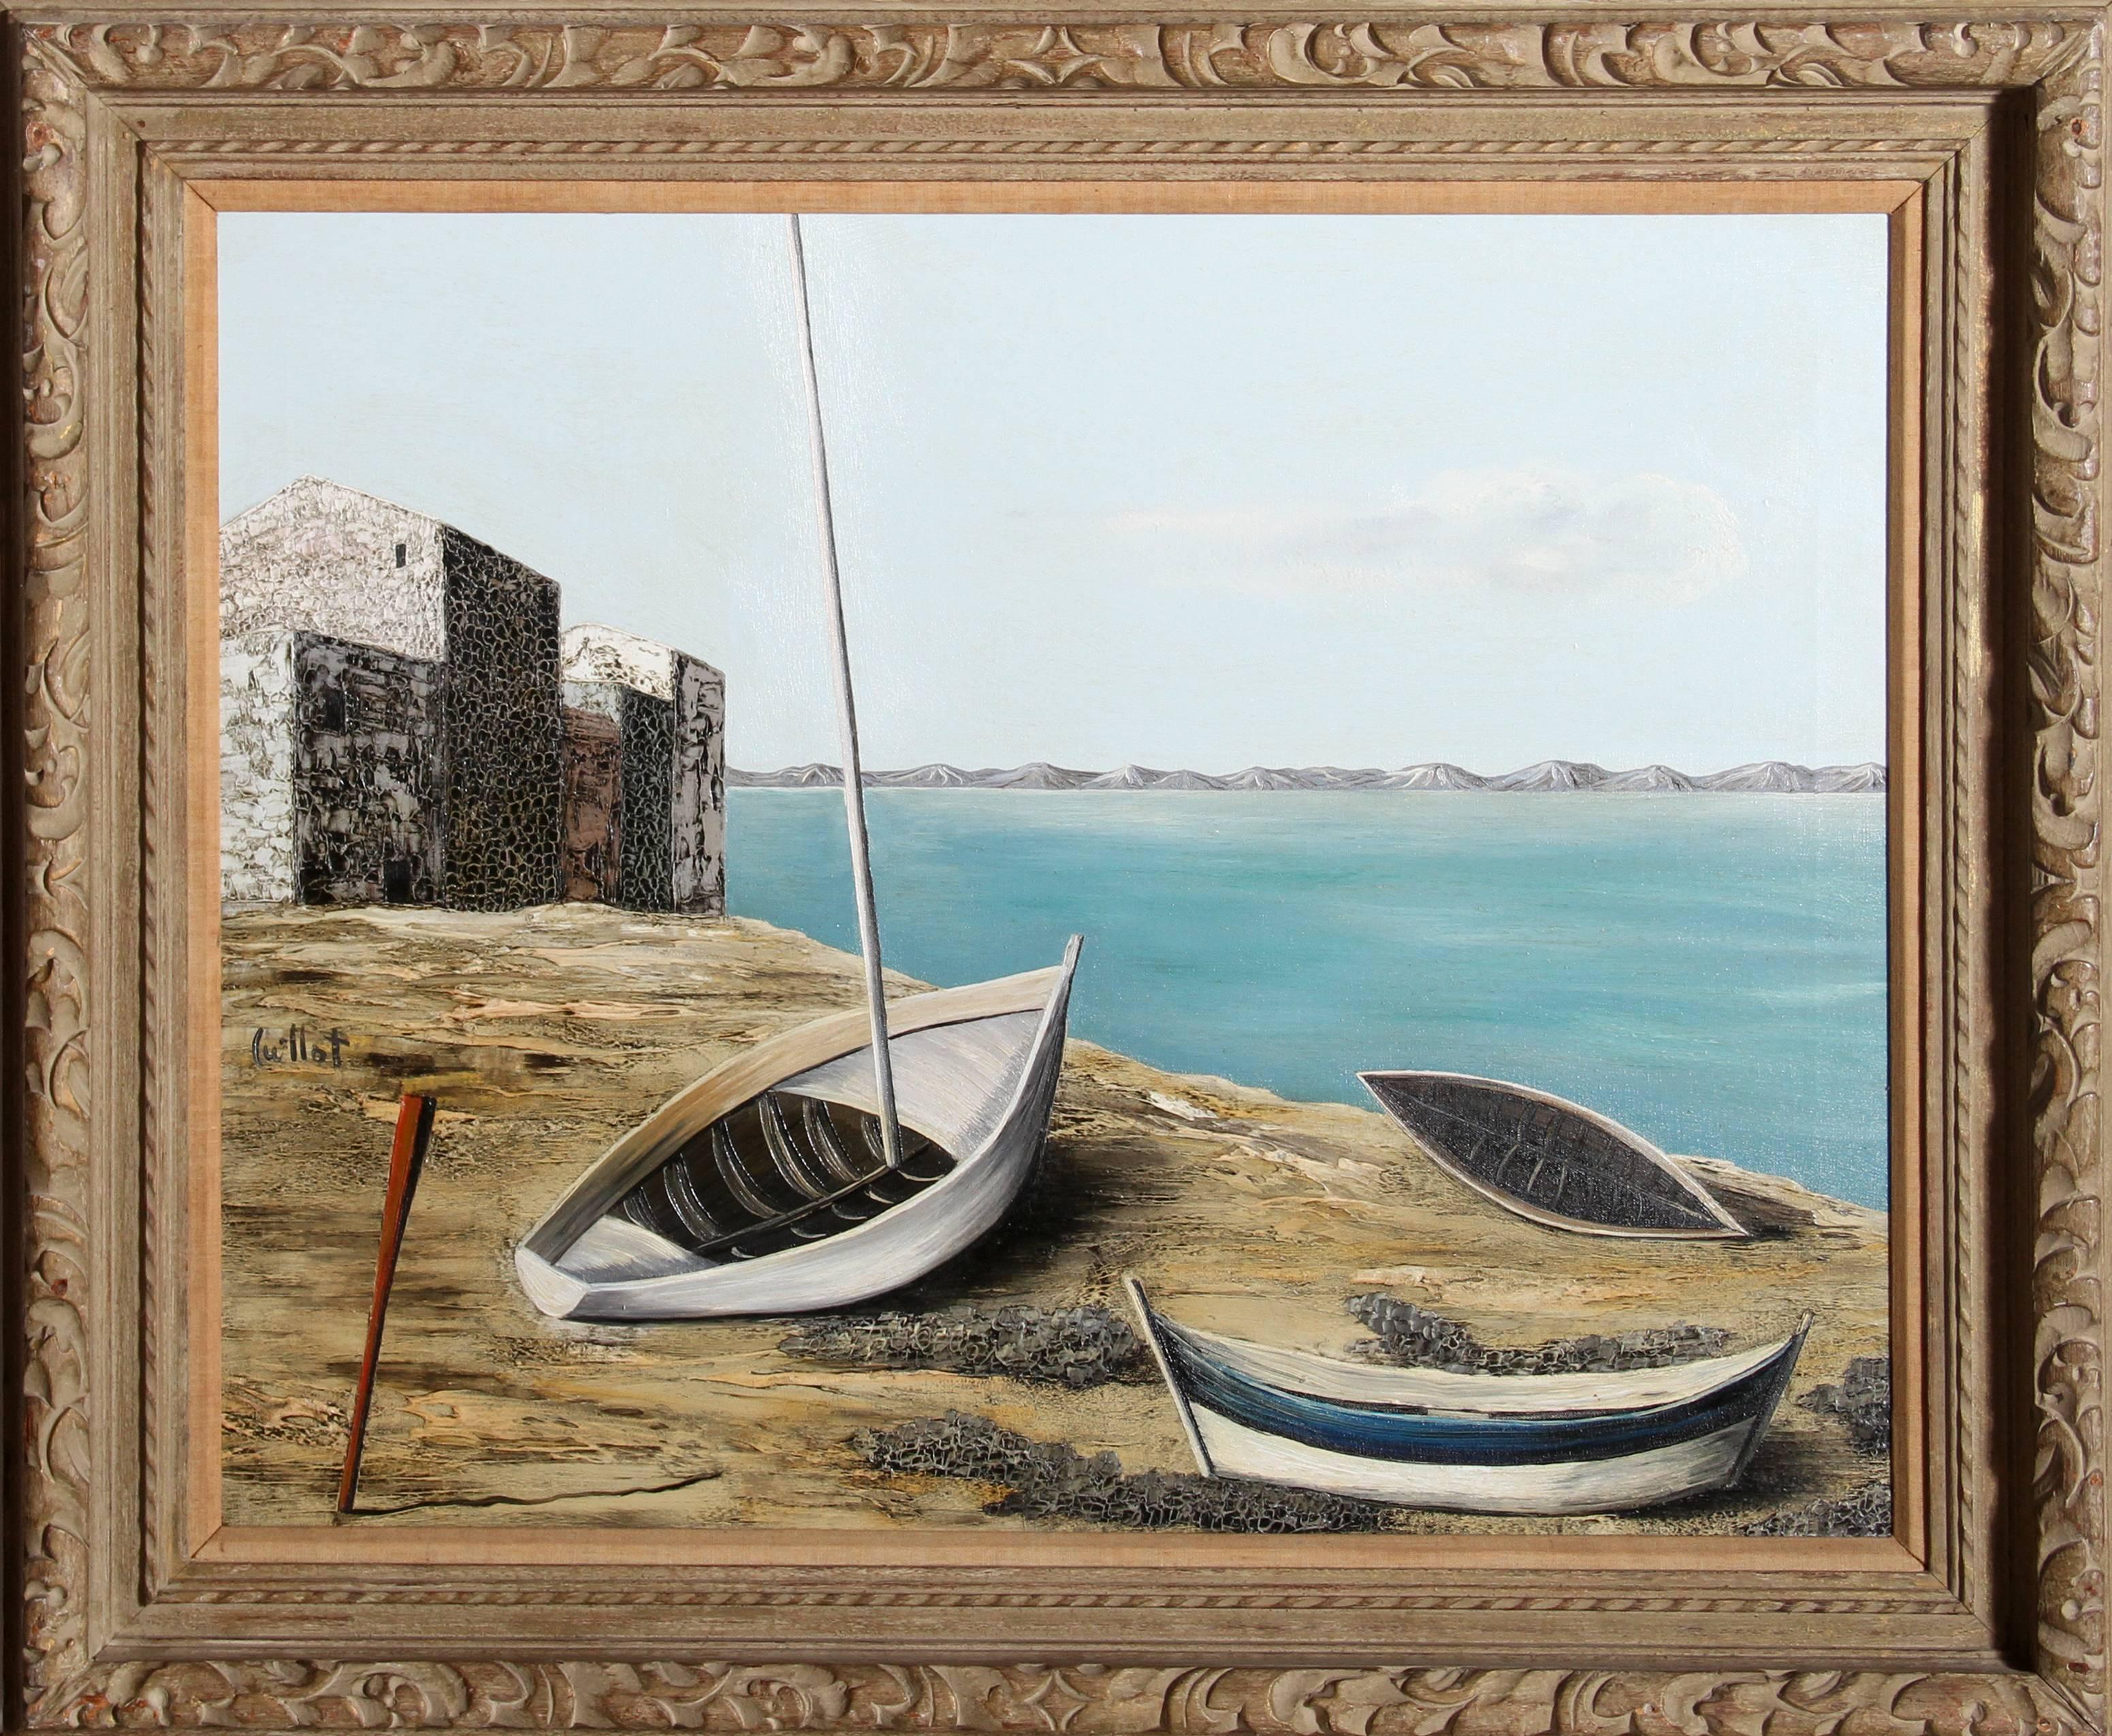 Bateaux, Oil Painting by Alvaro Guillot